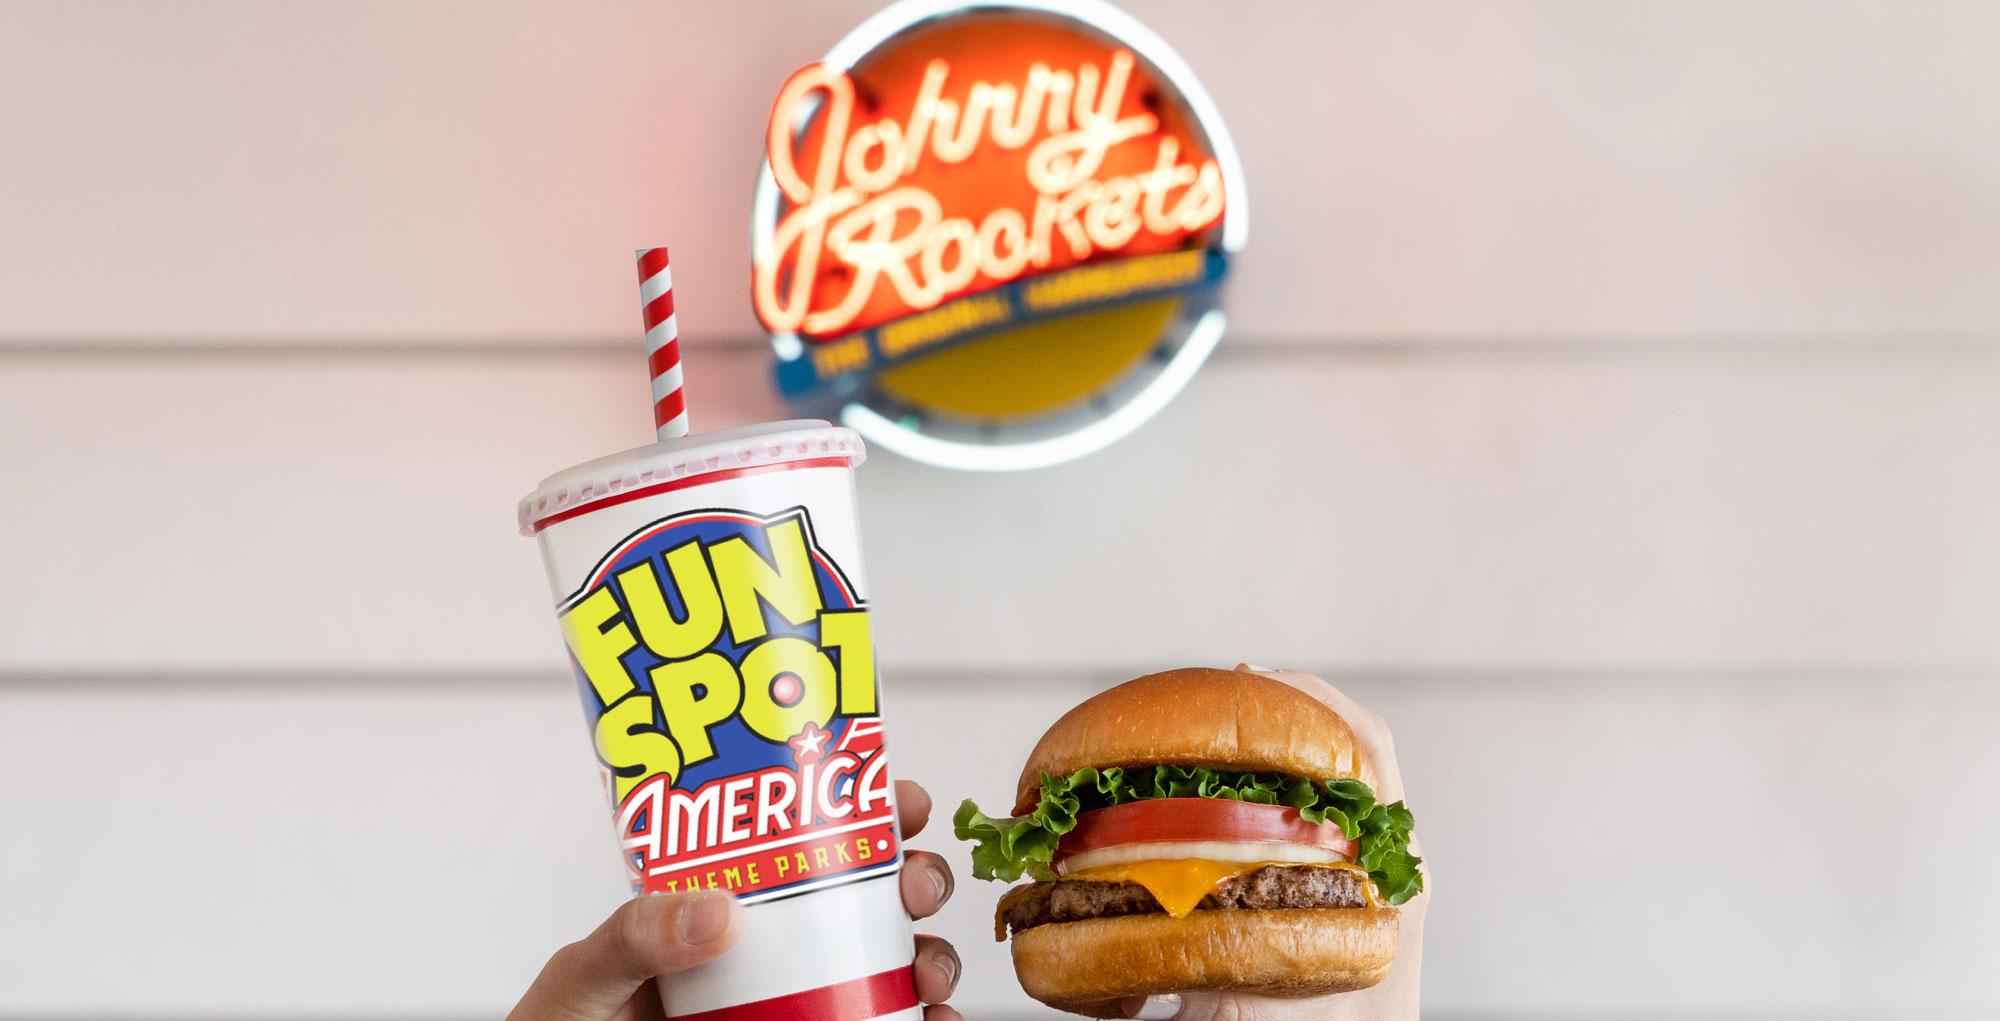 Fun Spot America and Johnny Rockets.